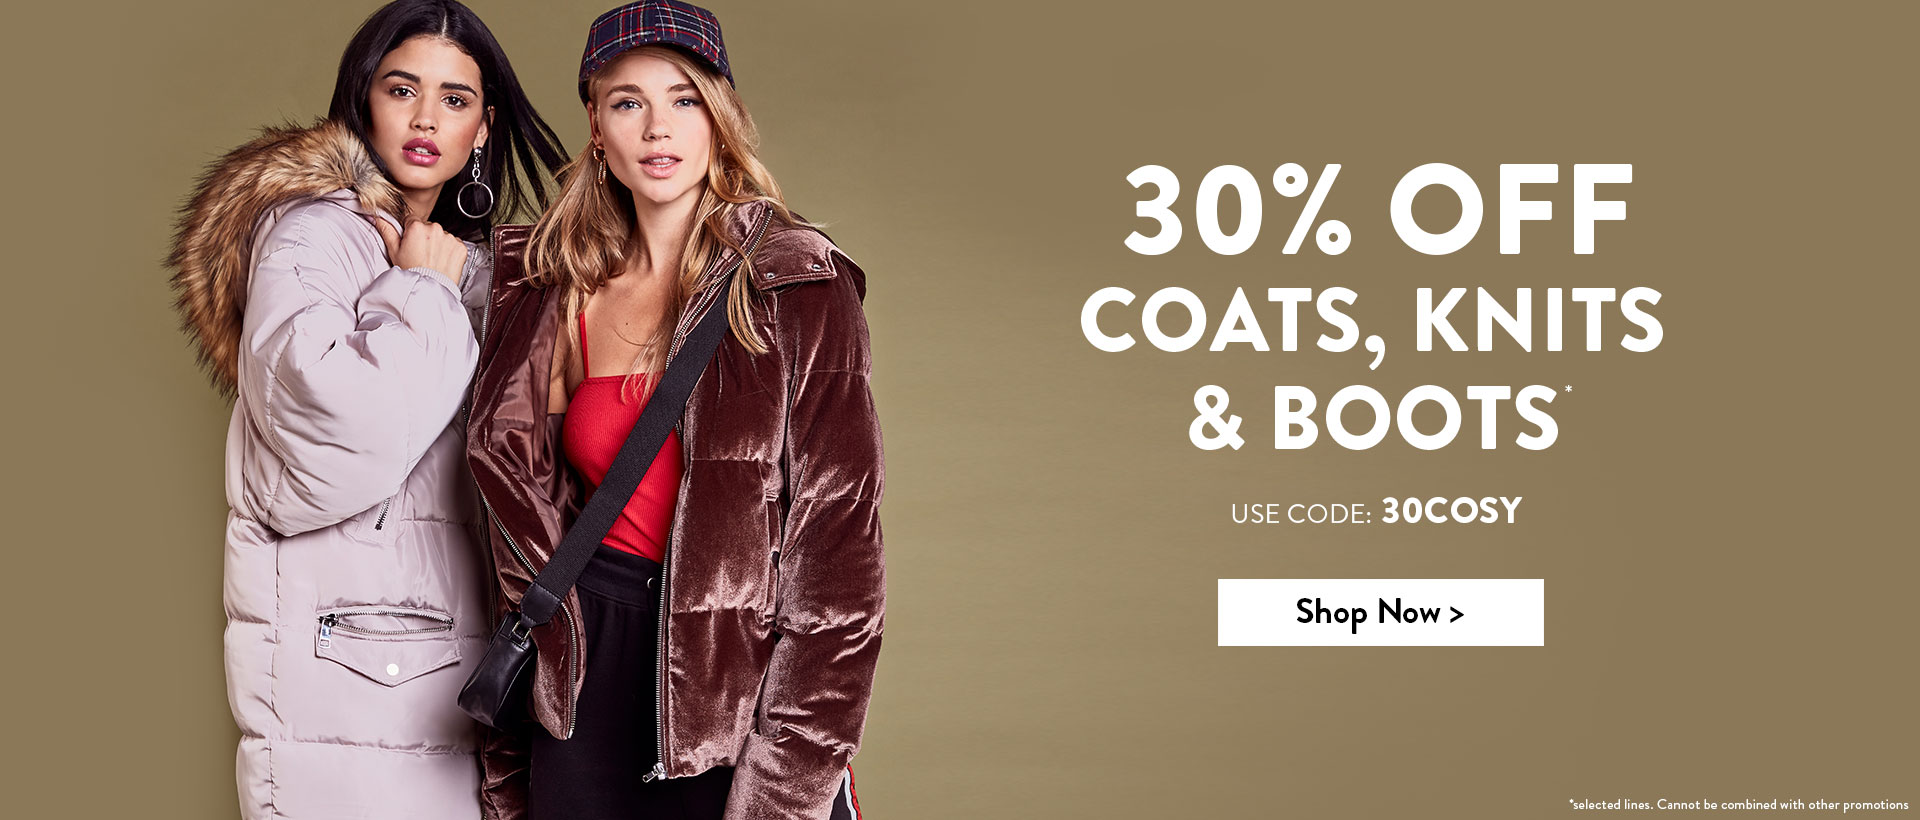 Clothes Women S Men S Clothing Fashion Online Shopping